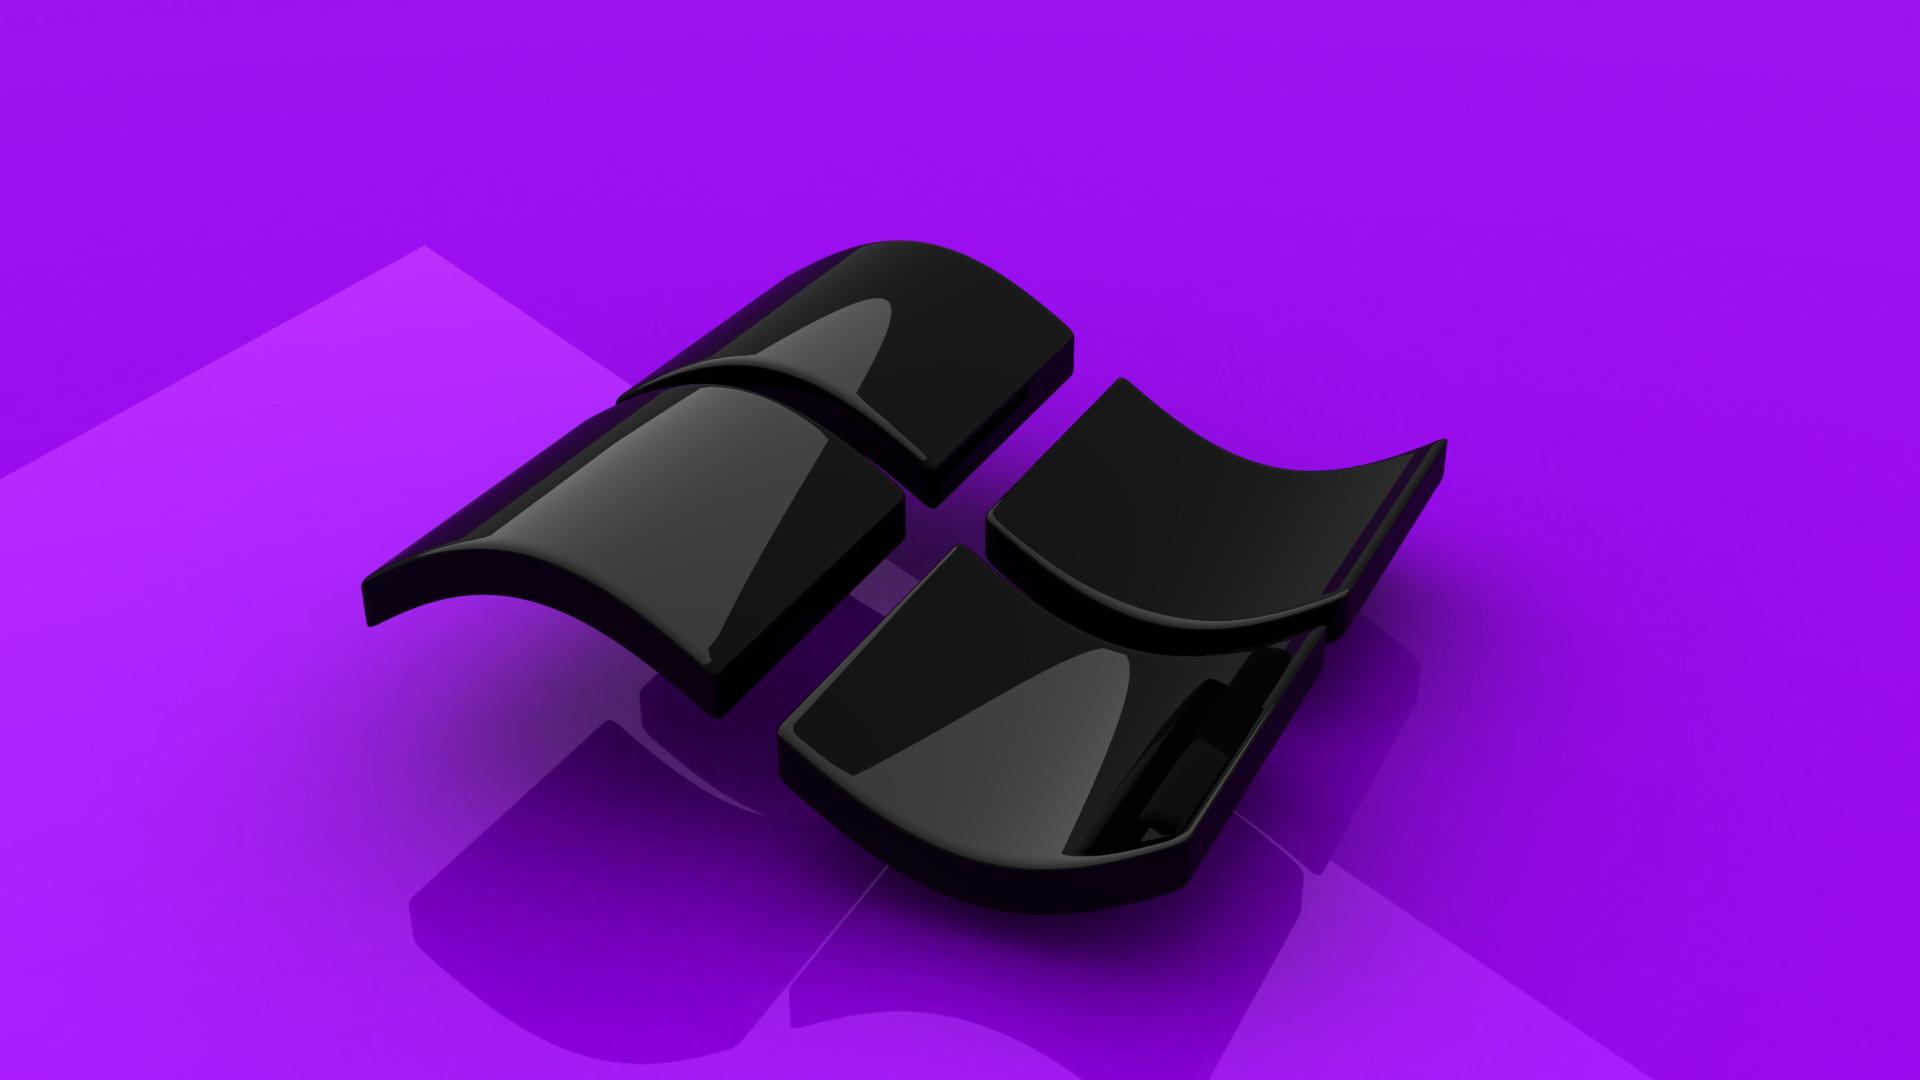 Windows Microsoft Gloss Lilac Ultra Hd Hd Wallpapers